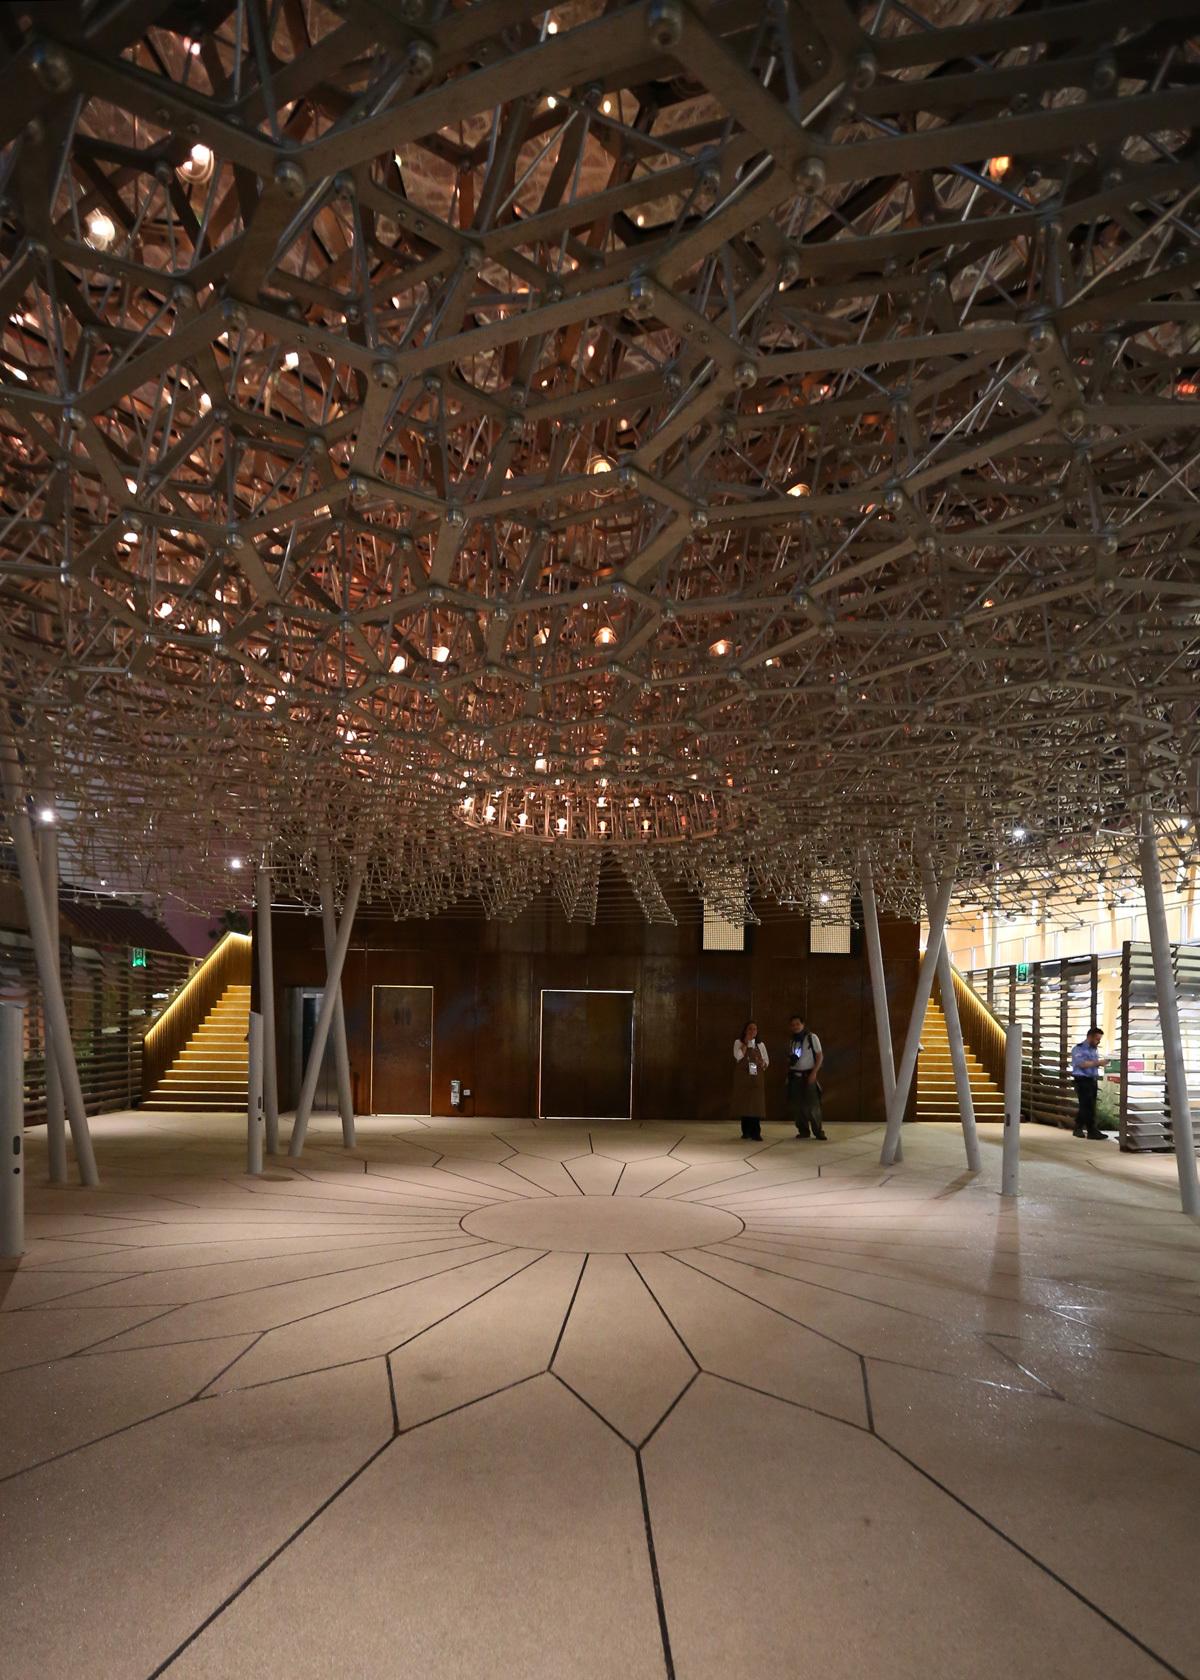 Sous la ruche, la nuit - Expo 2015, UK Pavillon, Milan, Italy - Architects BDP - Artist Wolfgang Buttress - Photo Jean-Yves Soetinck